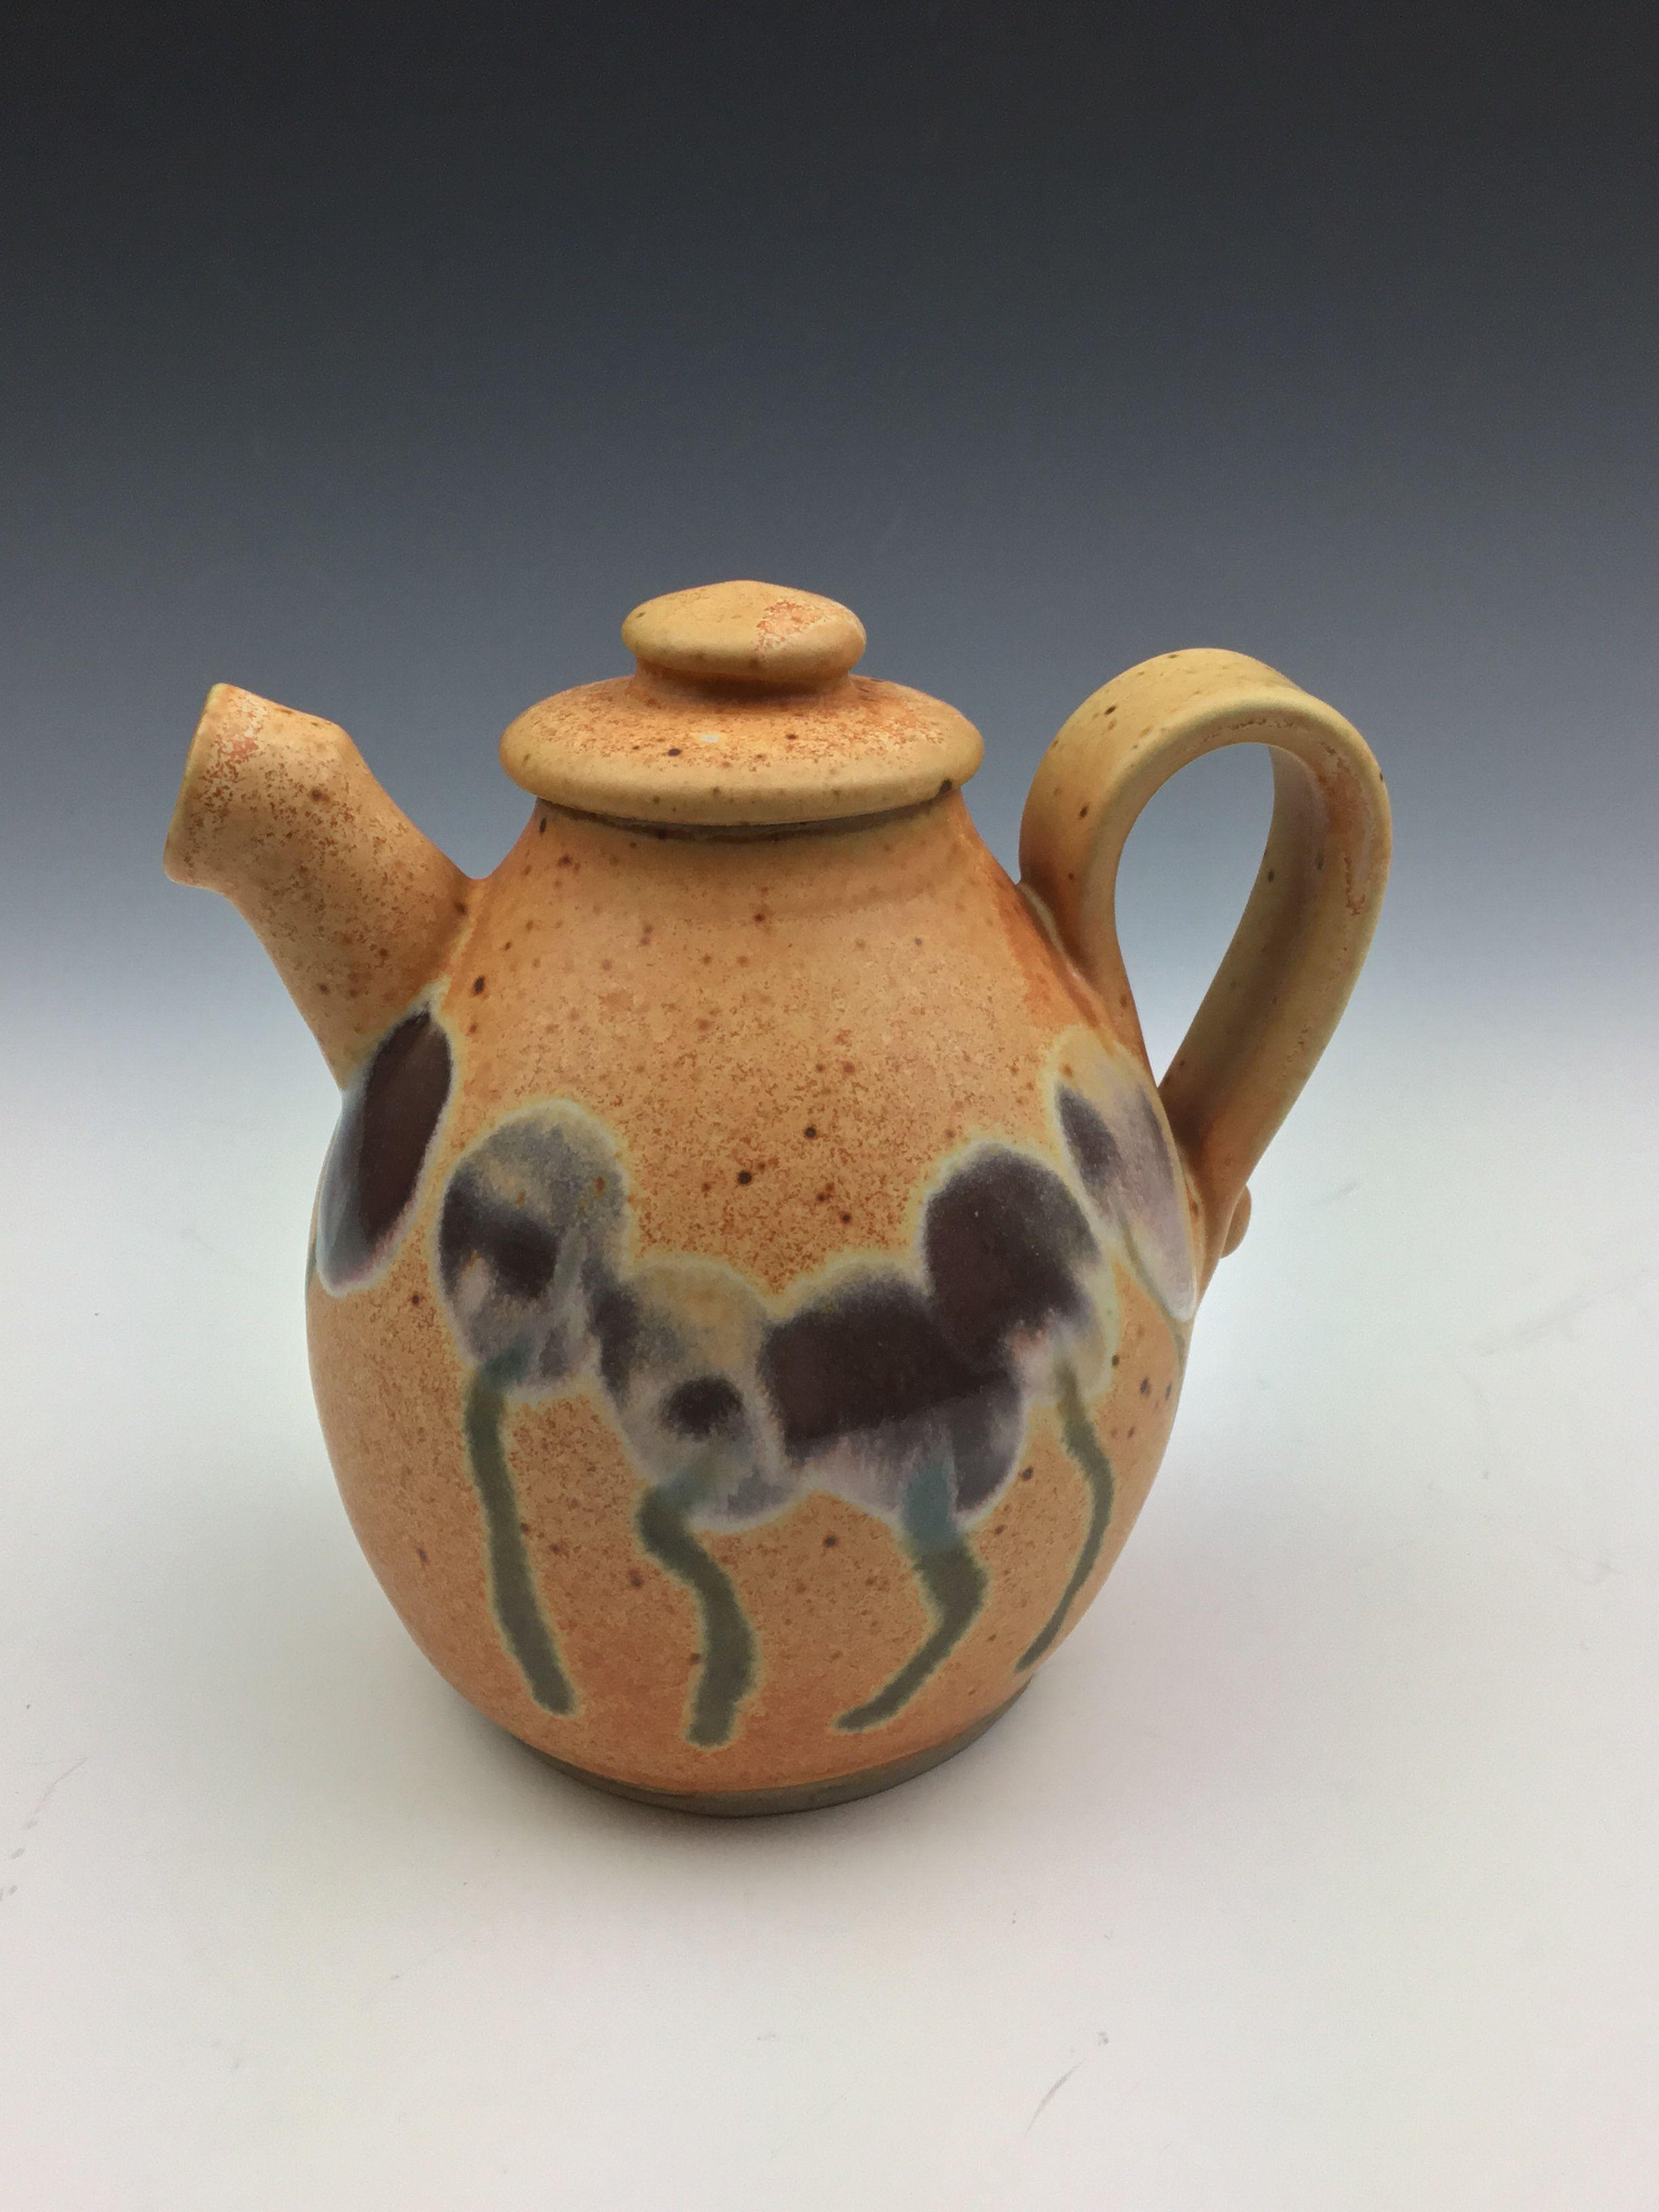 Knowmad digital marketinguniversity of north carolina at chapel hill. Small tea pot | Tea pots, Pottery, Handmade pottery